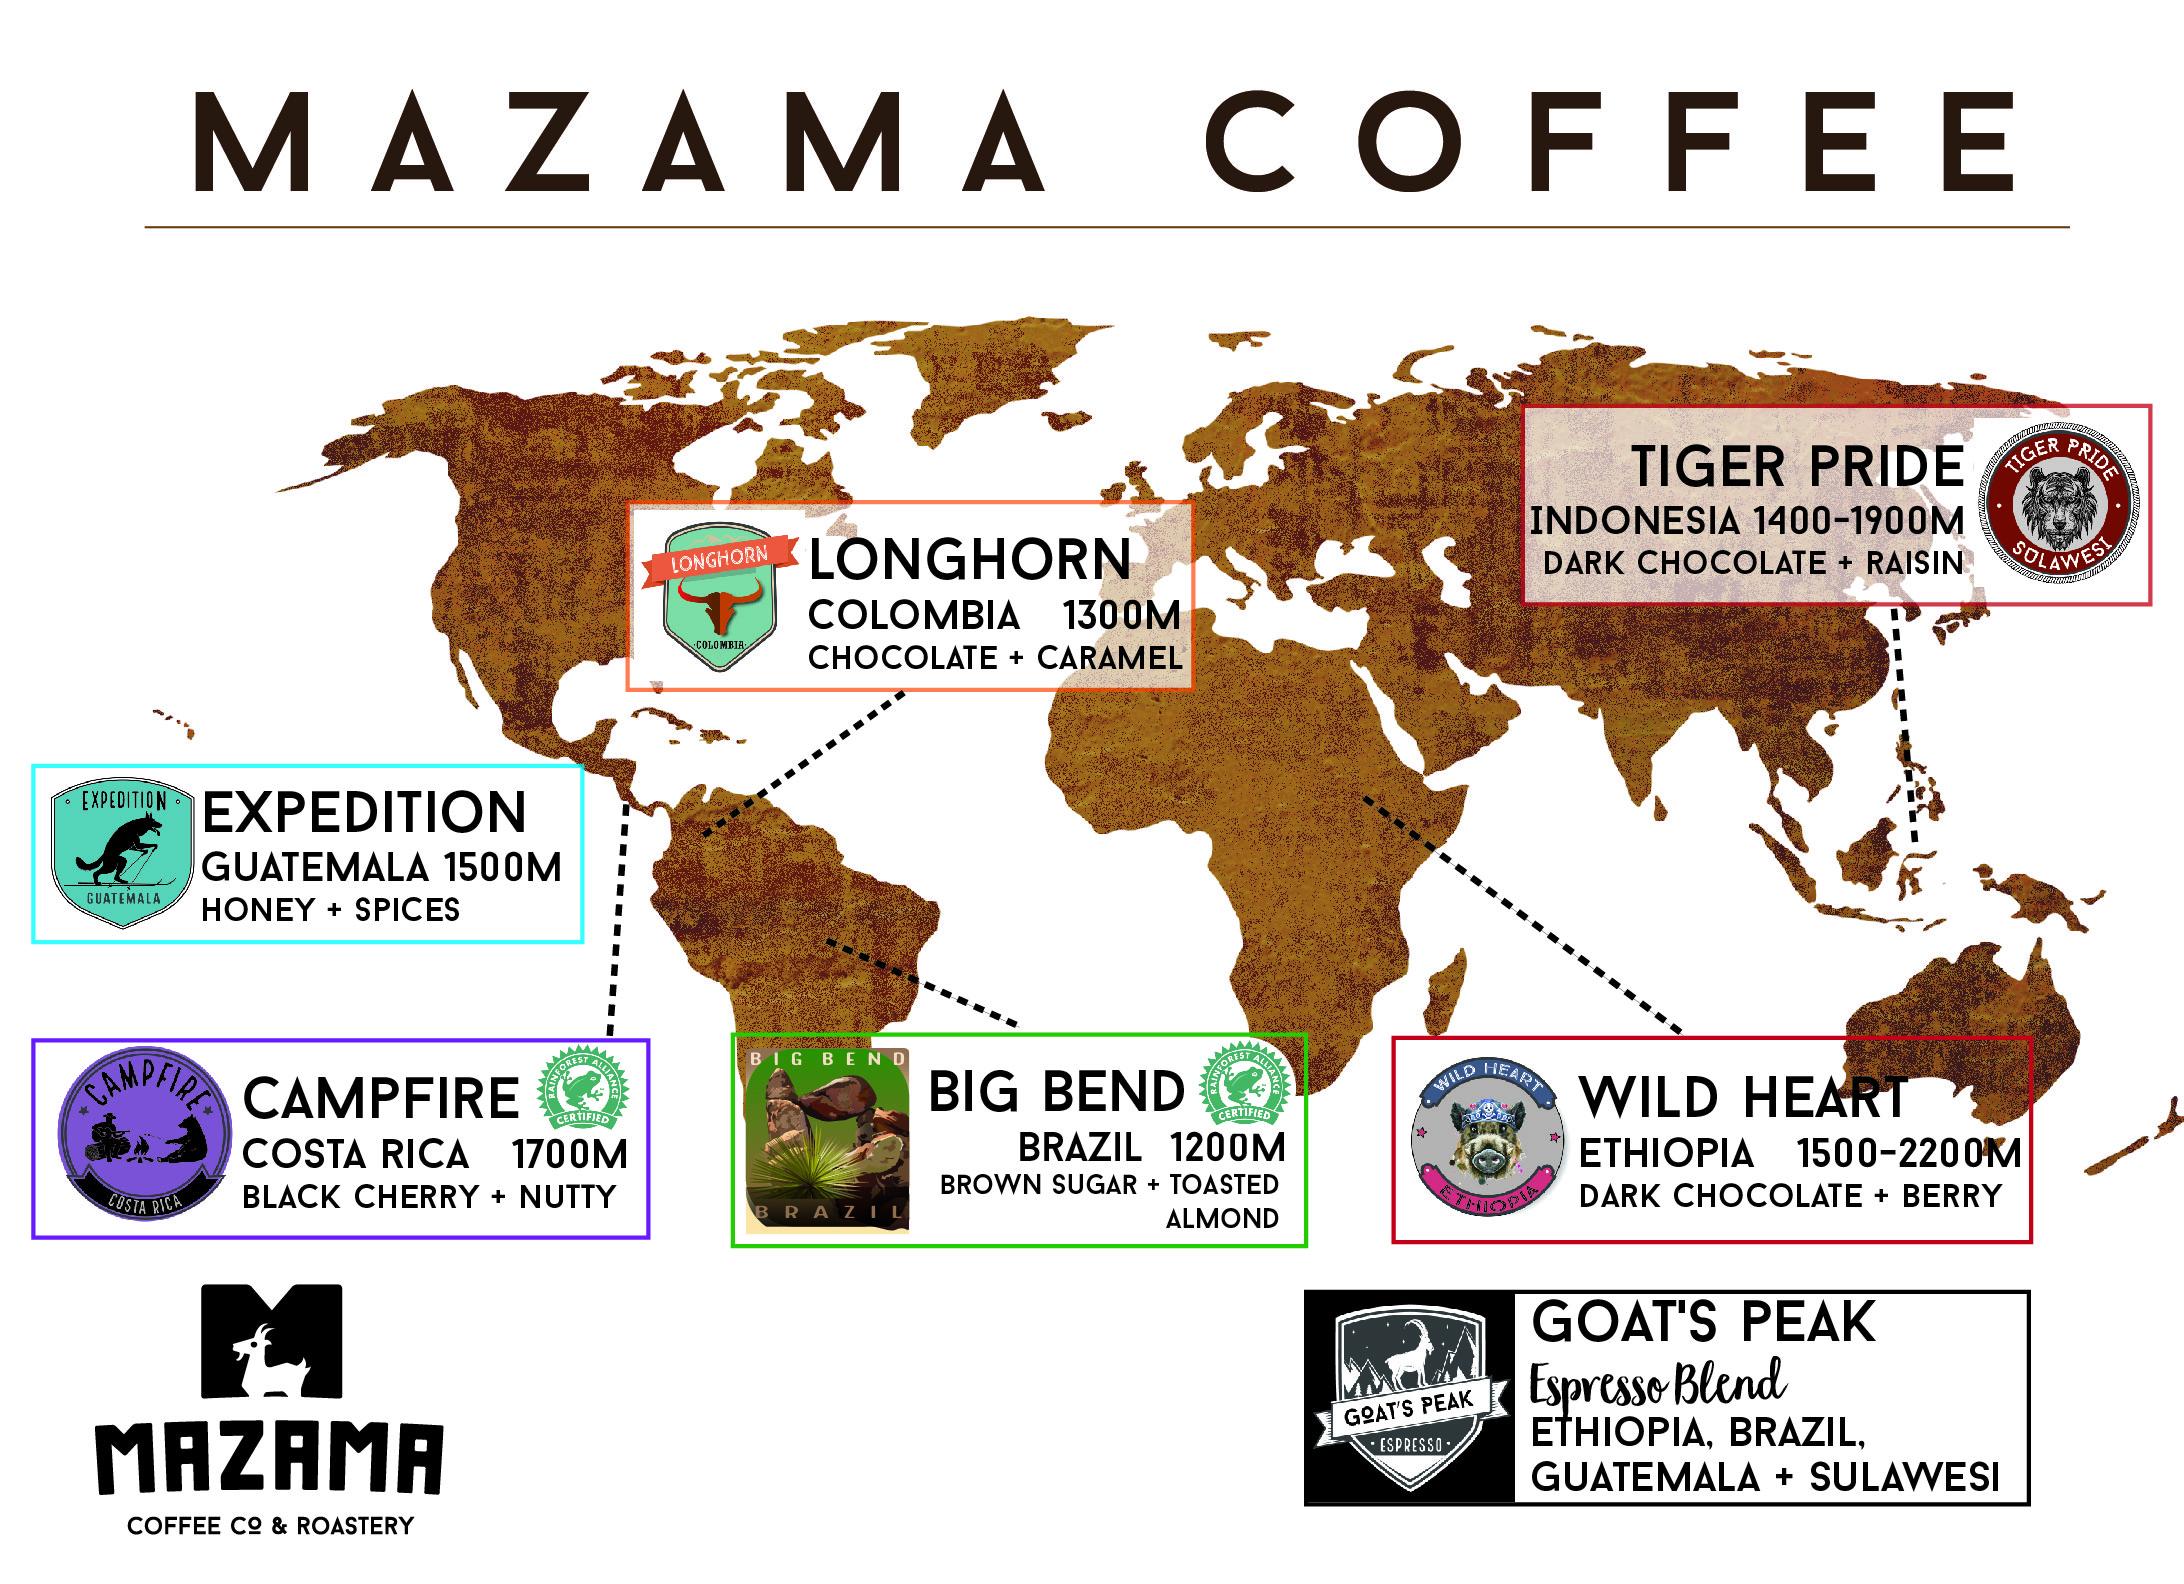 coffee-offering-postcard-5x7-revised-BACK_BACK.JPG